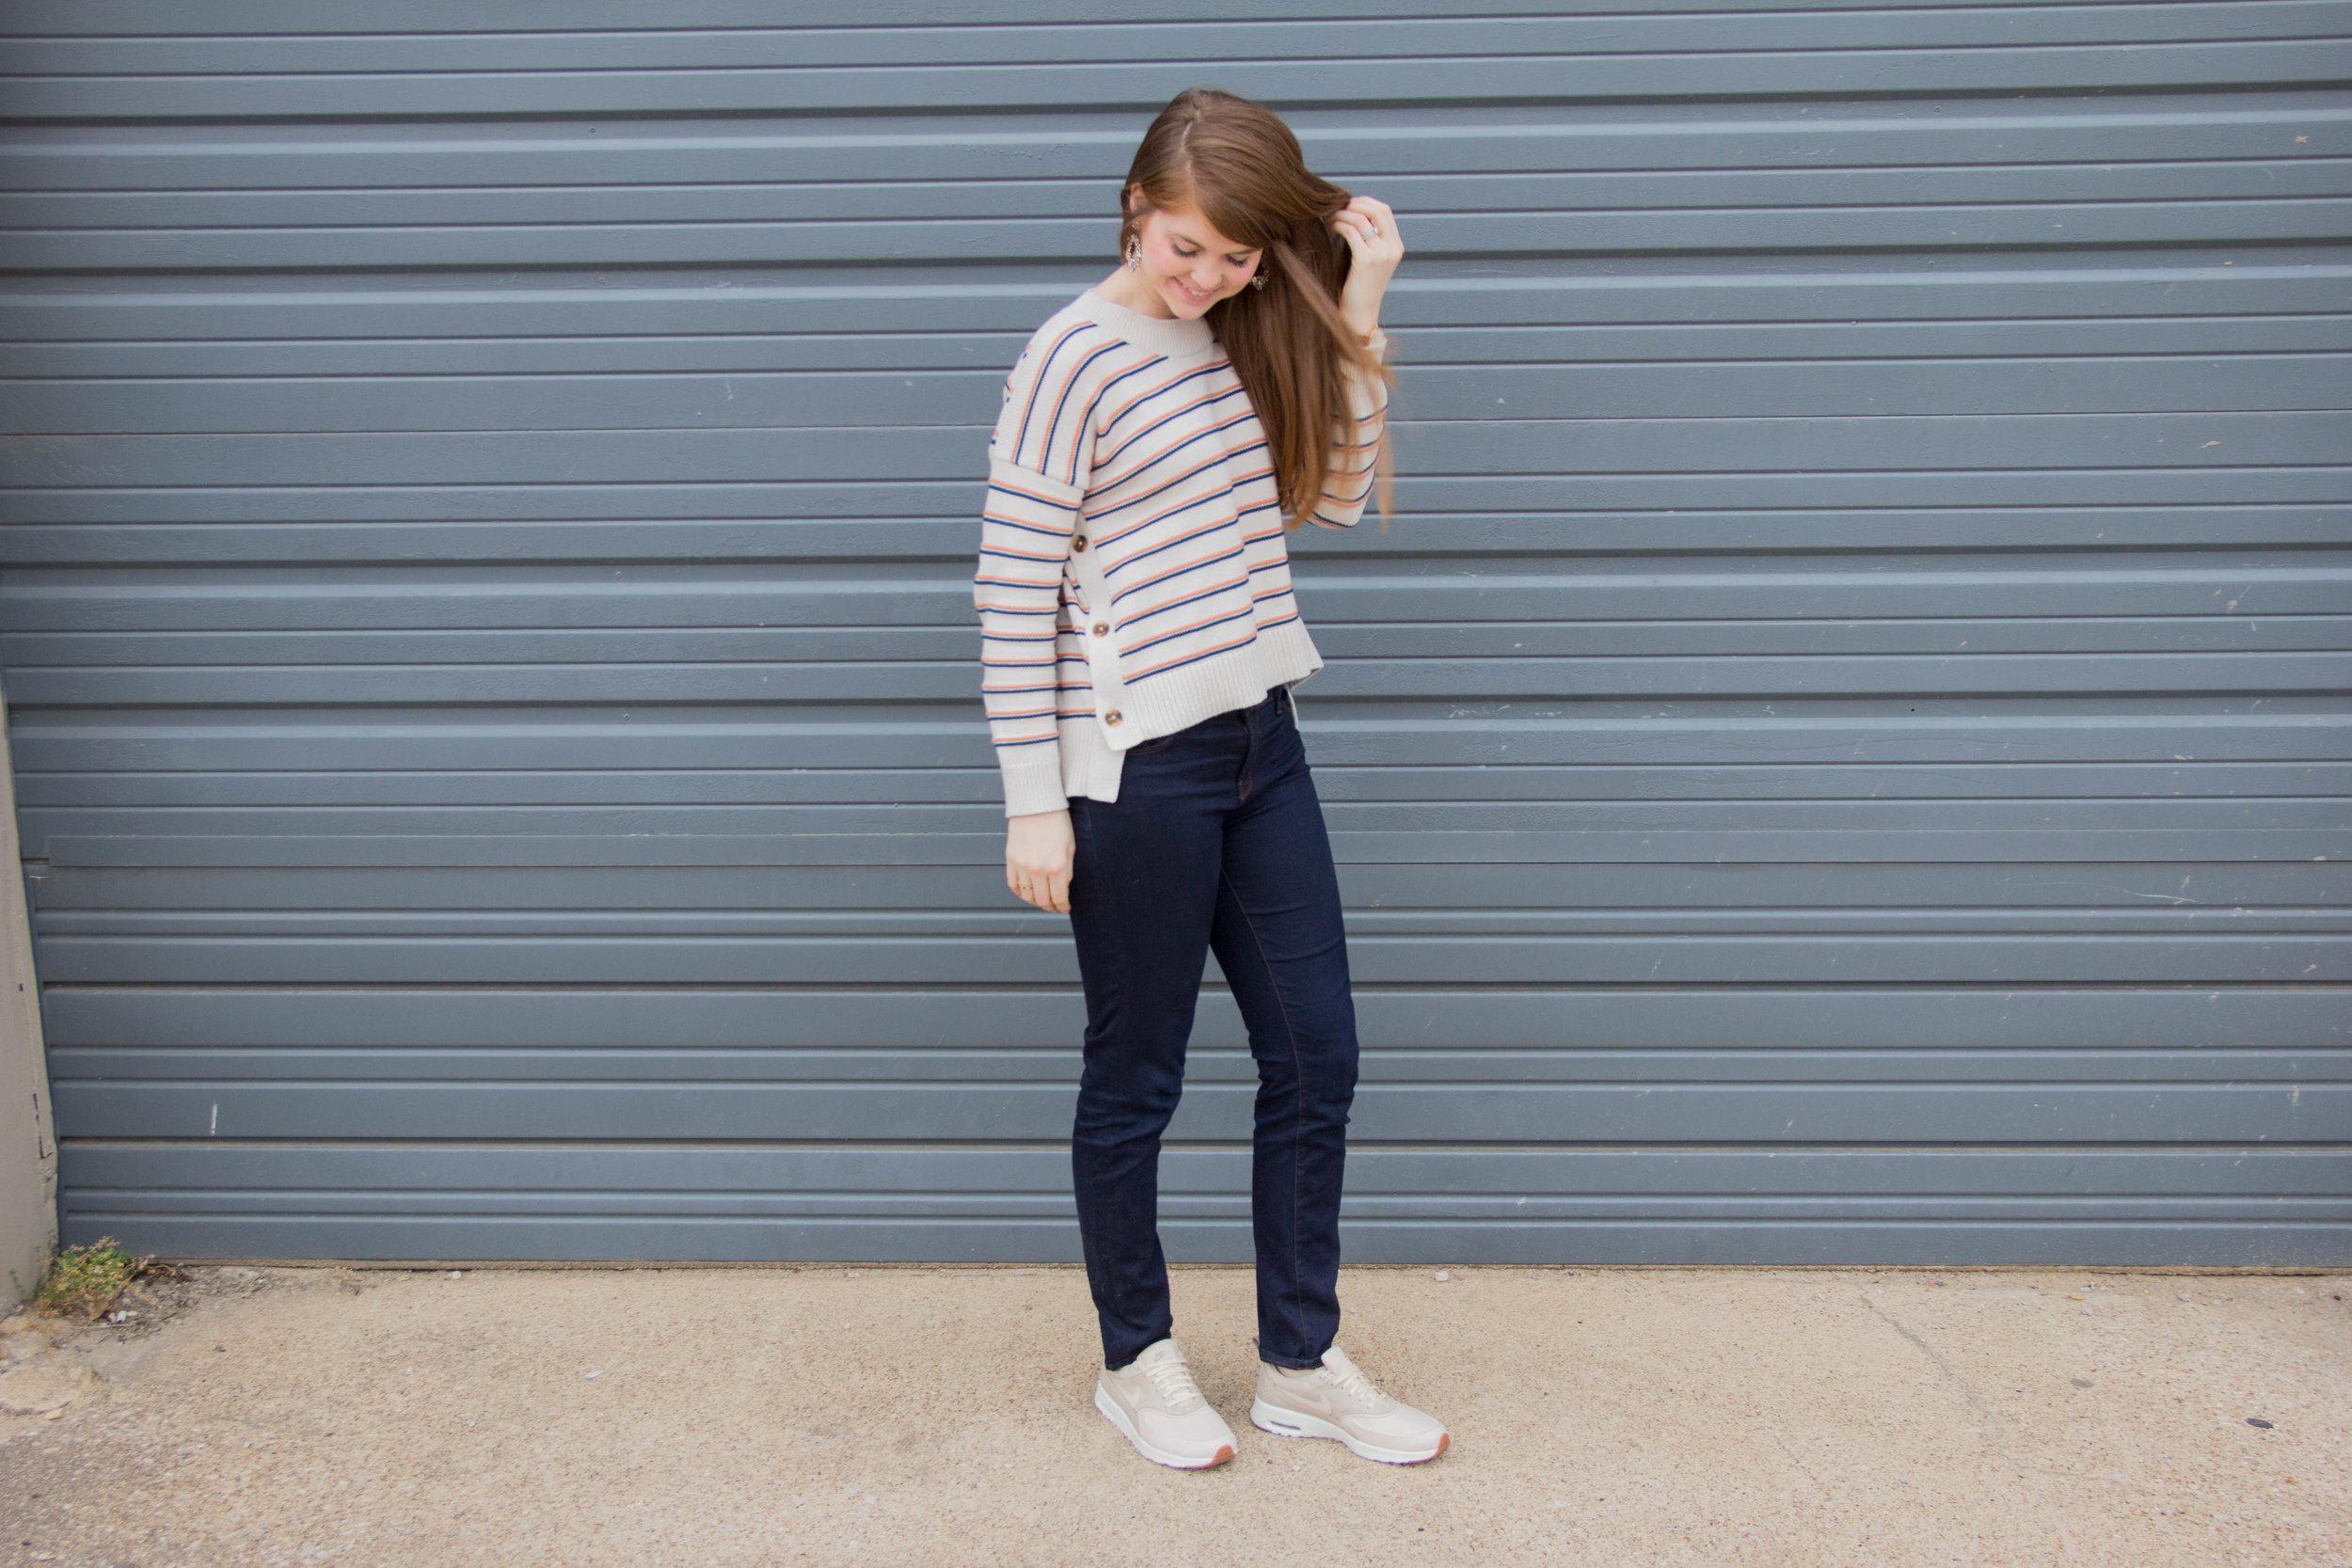 nike air max thea, nike tennis shoes, j brand jeans, madewell sweater, baublebar earrings